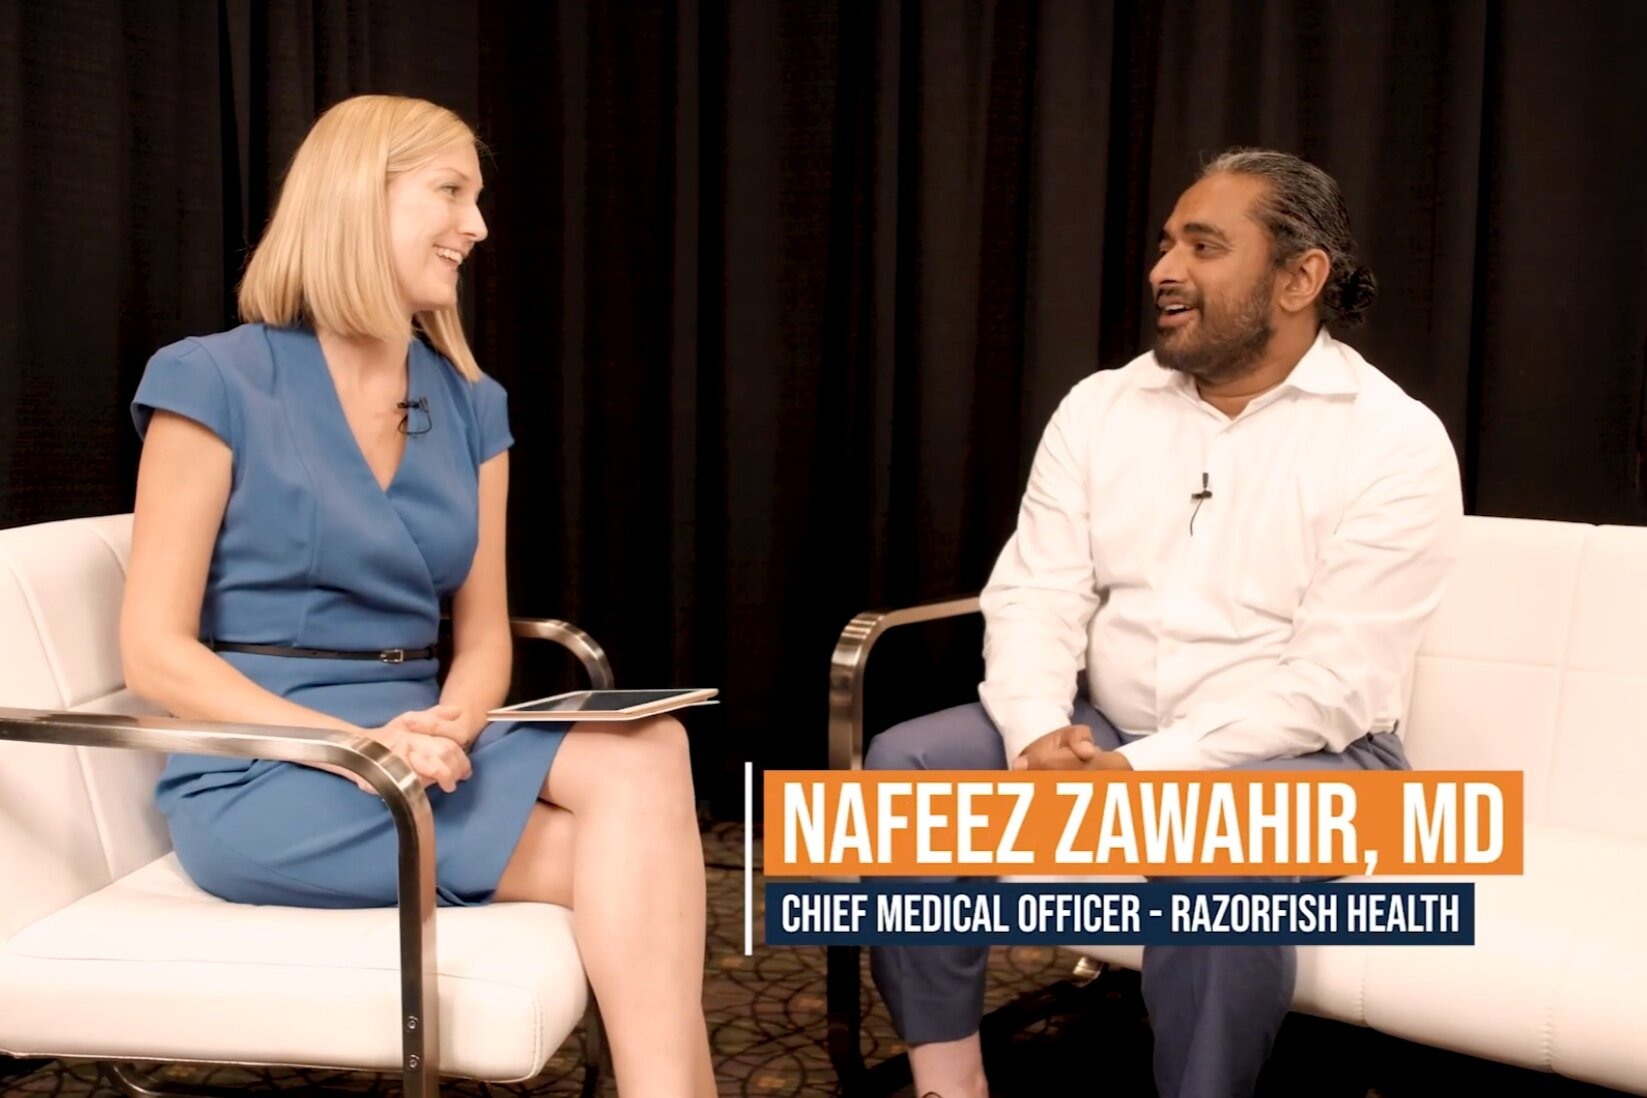 Rebecca WIllumson, Publisher, Fierce Pharma and Nafeez Zawahir, Chief Medical Officer, Razorfish Health.